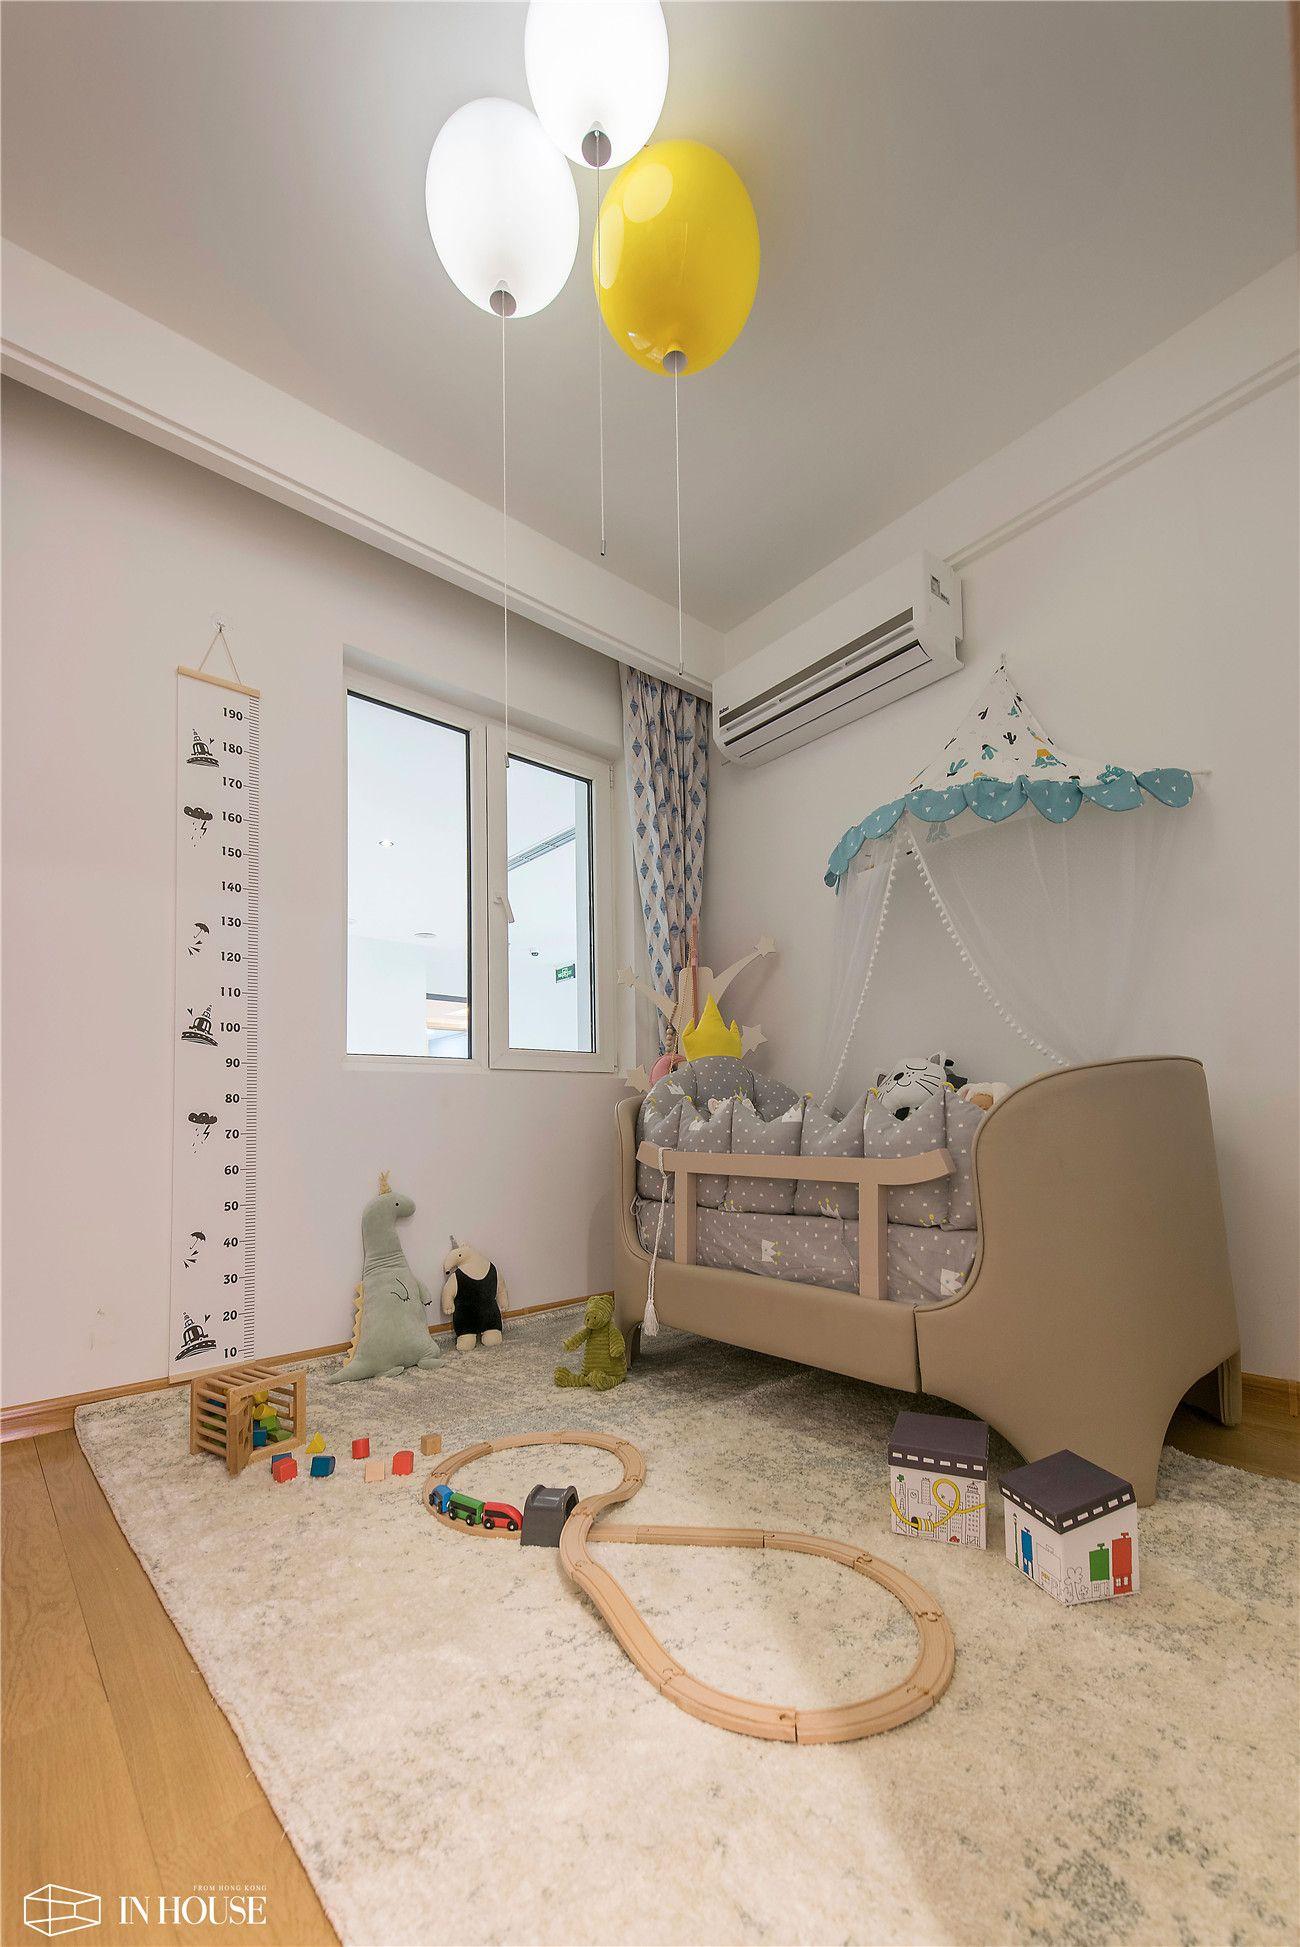 Home decor by Yoyo~ on Children's room | Decor, Kids rugs